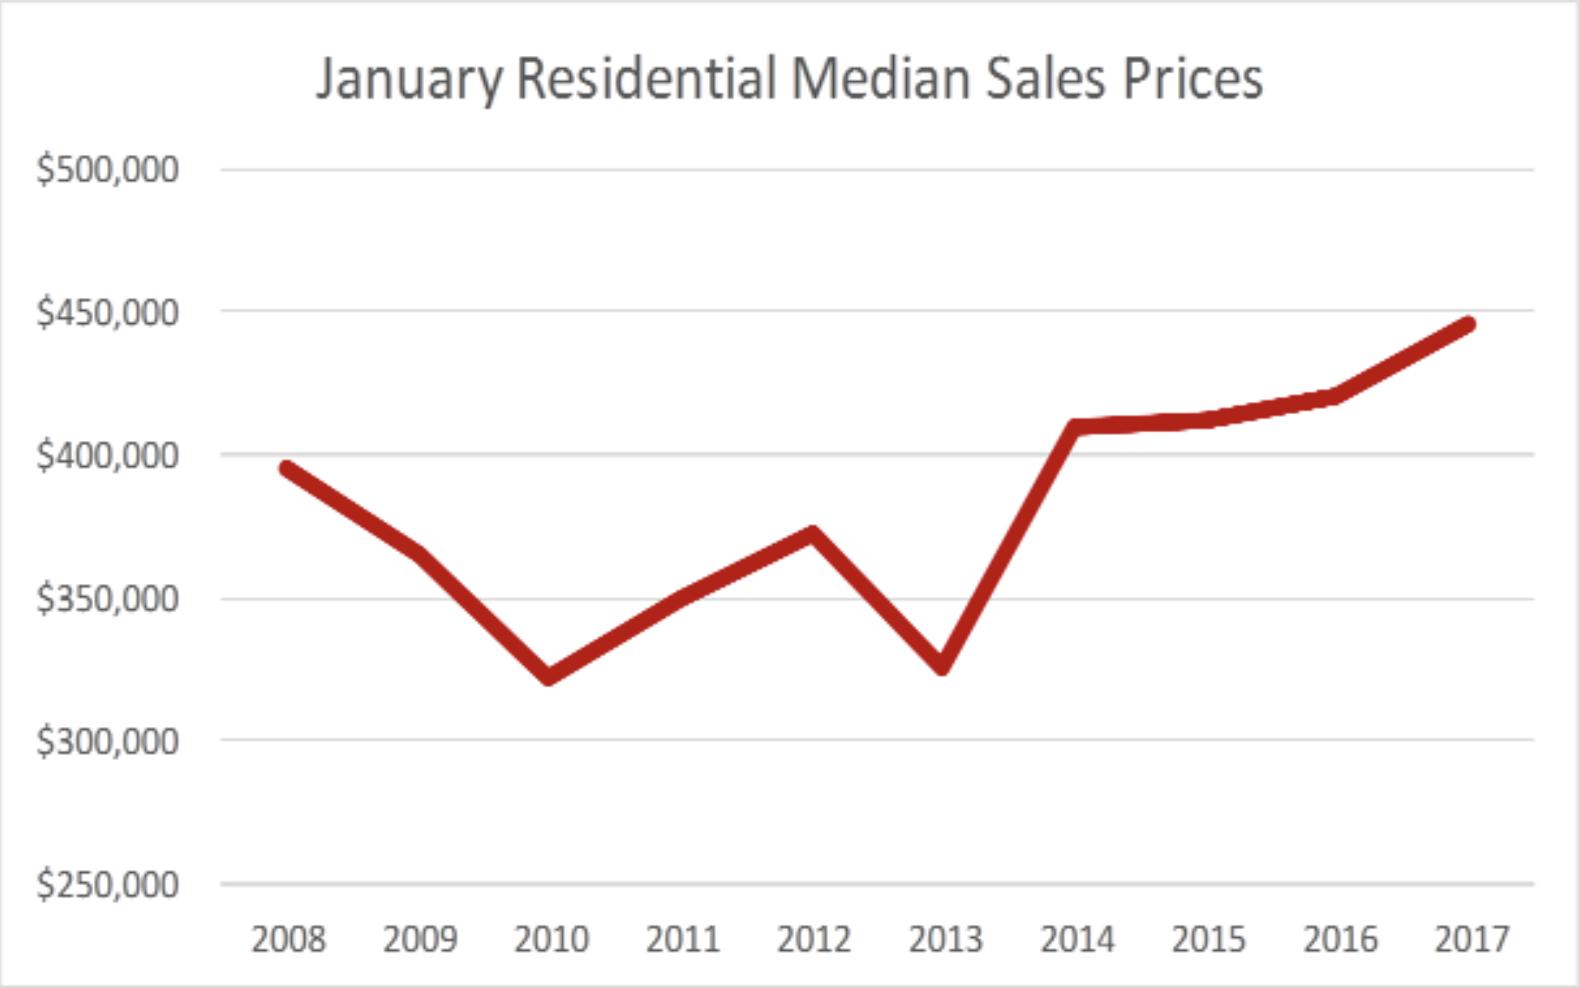 January Historic Residential Median Price